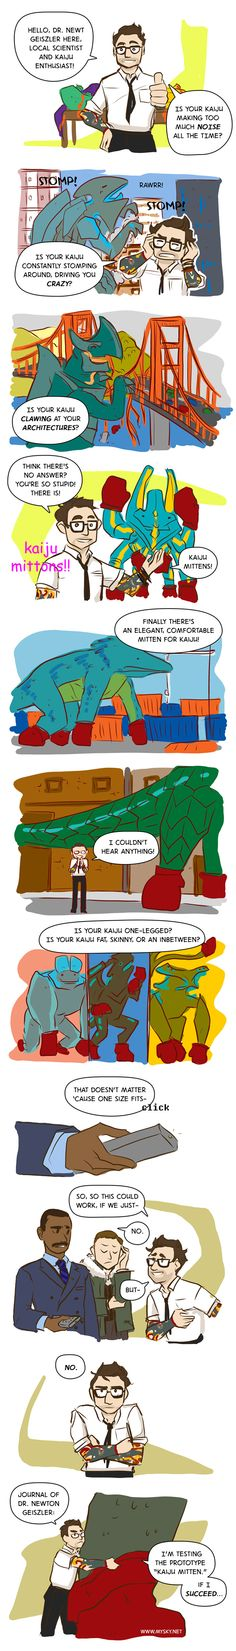 Kaiju Mittens! #PacificRim + #AlwaysSunny = <3